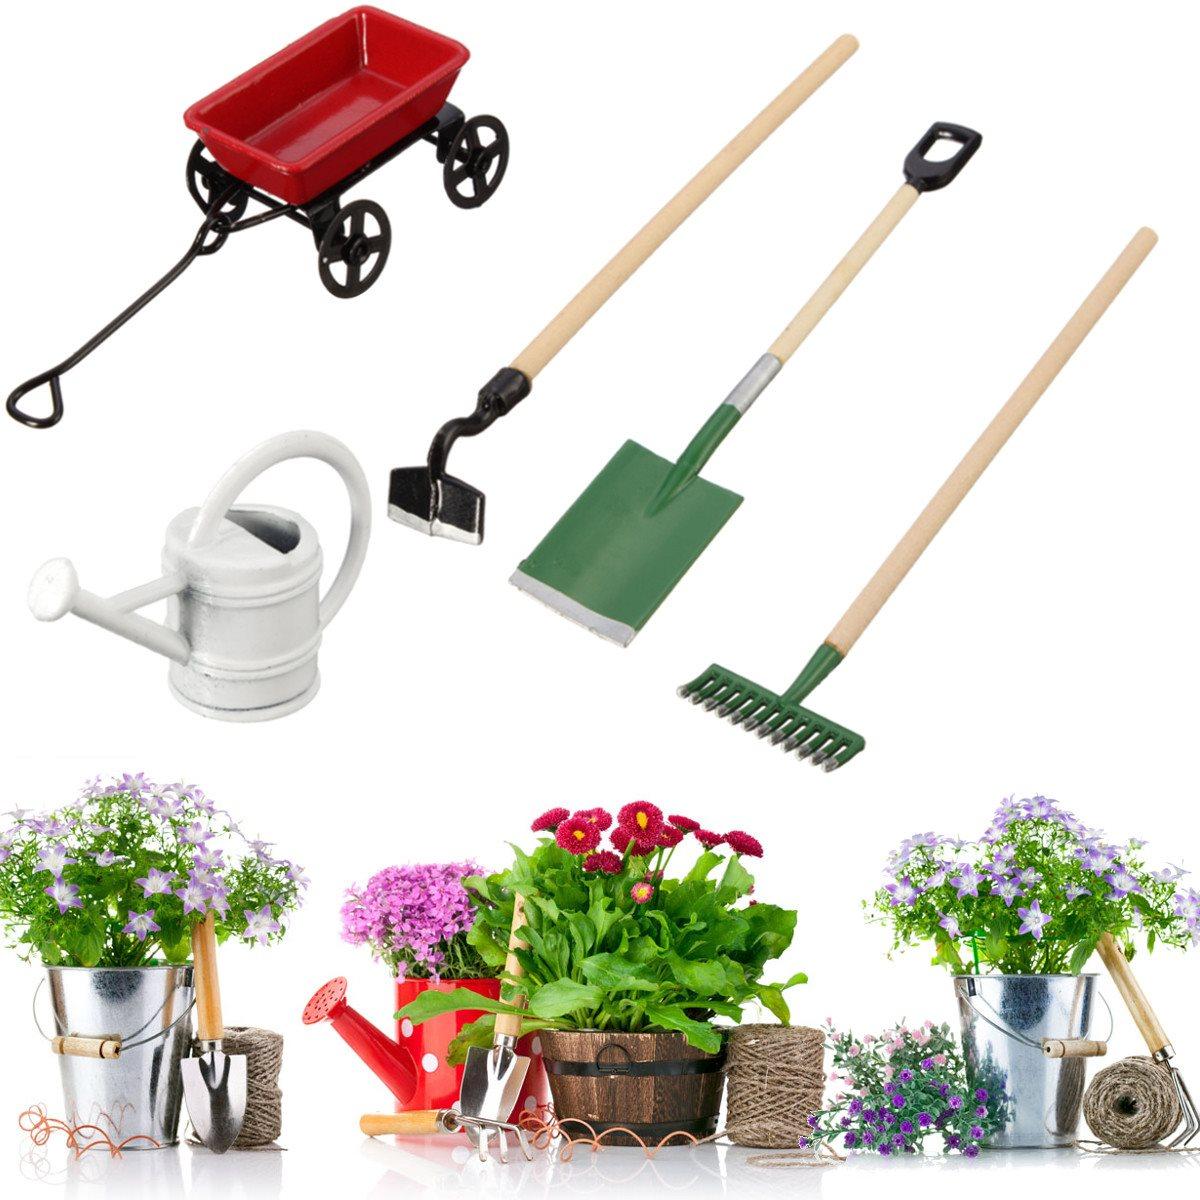 Diy miniatura metal watering can pulling cart spade rake for Garden house for tools